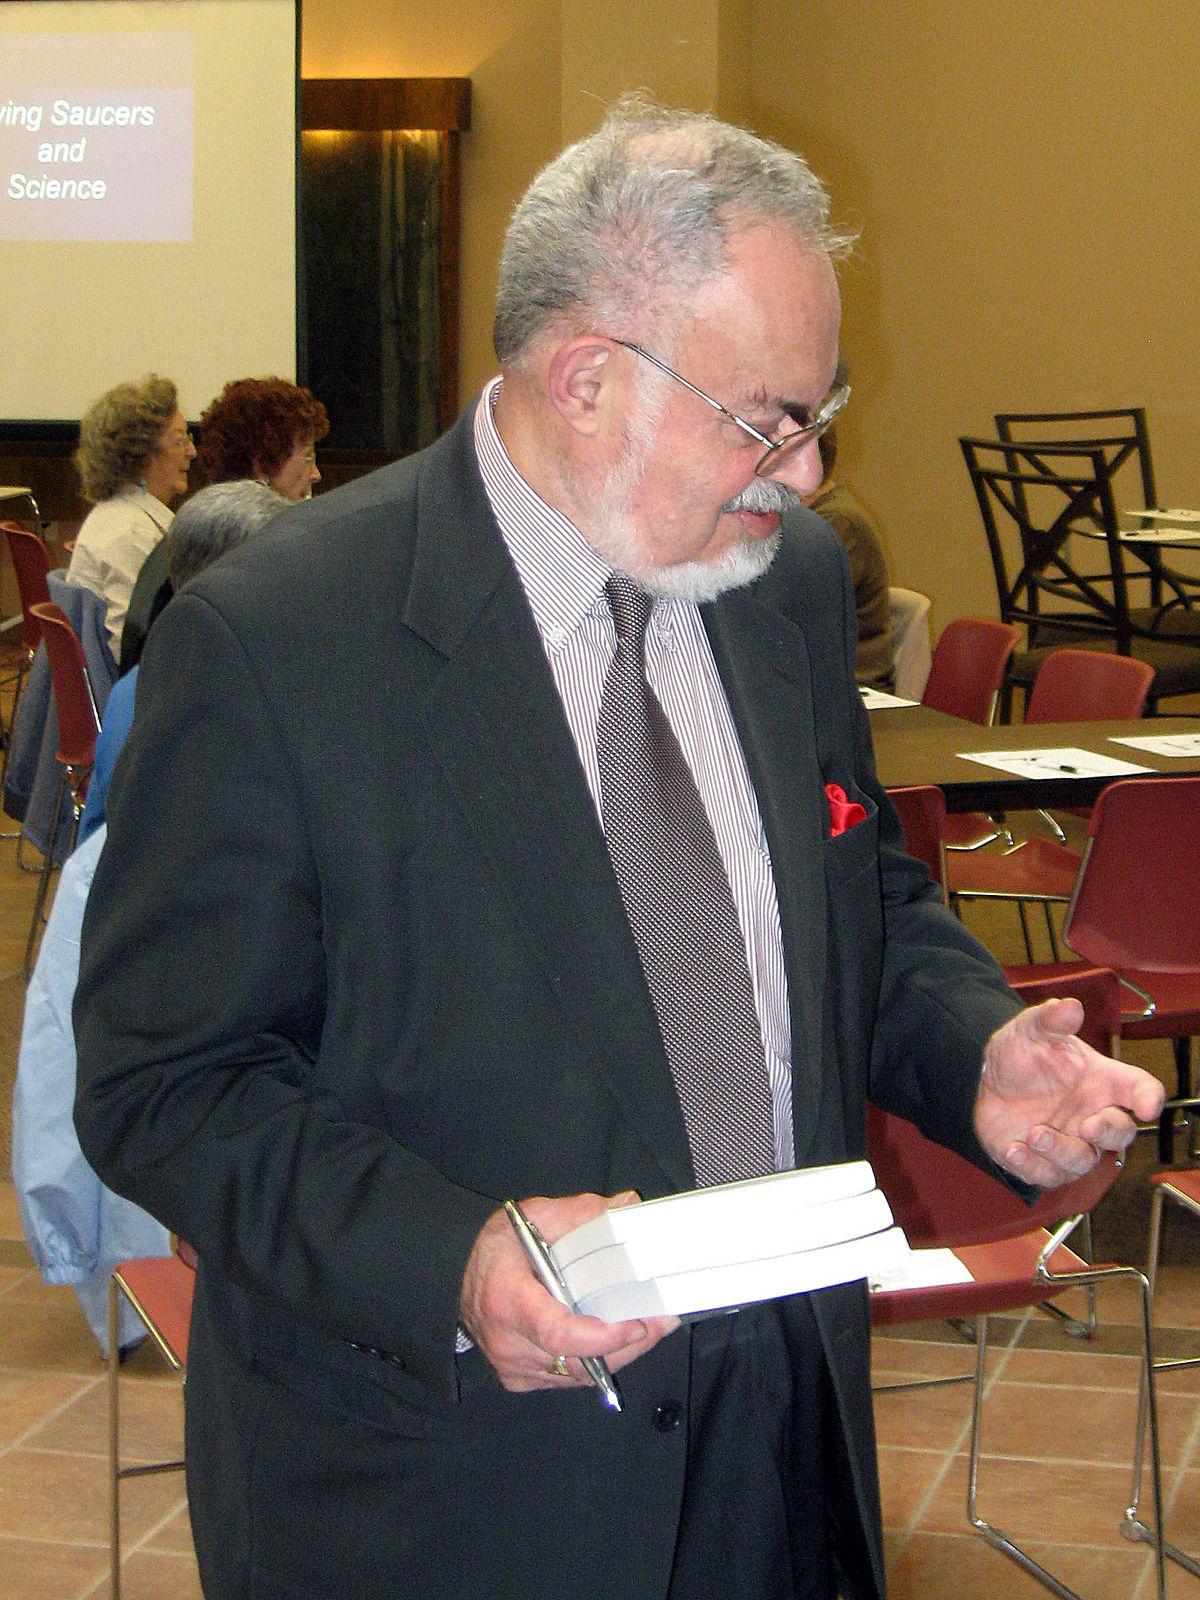 Stanton T Friedman  Wikipedia